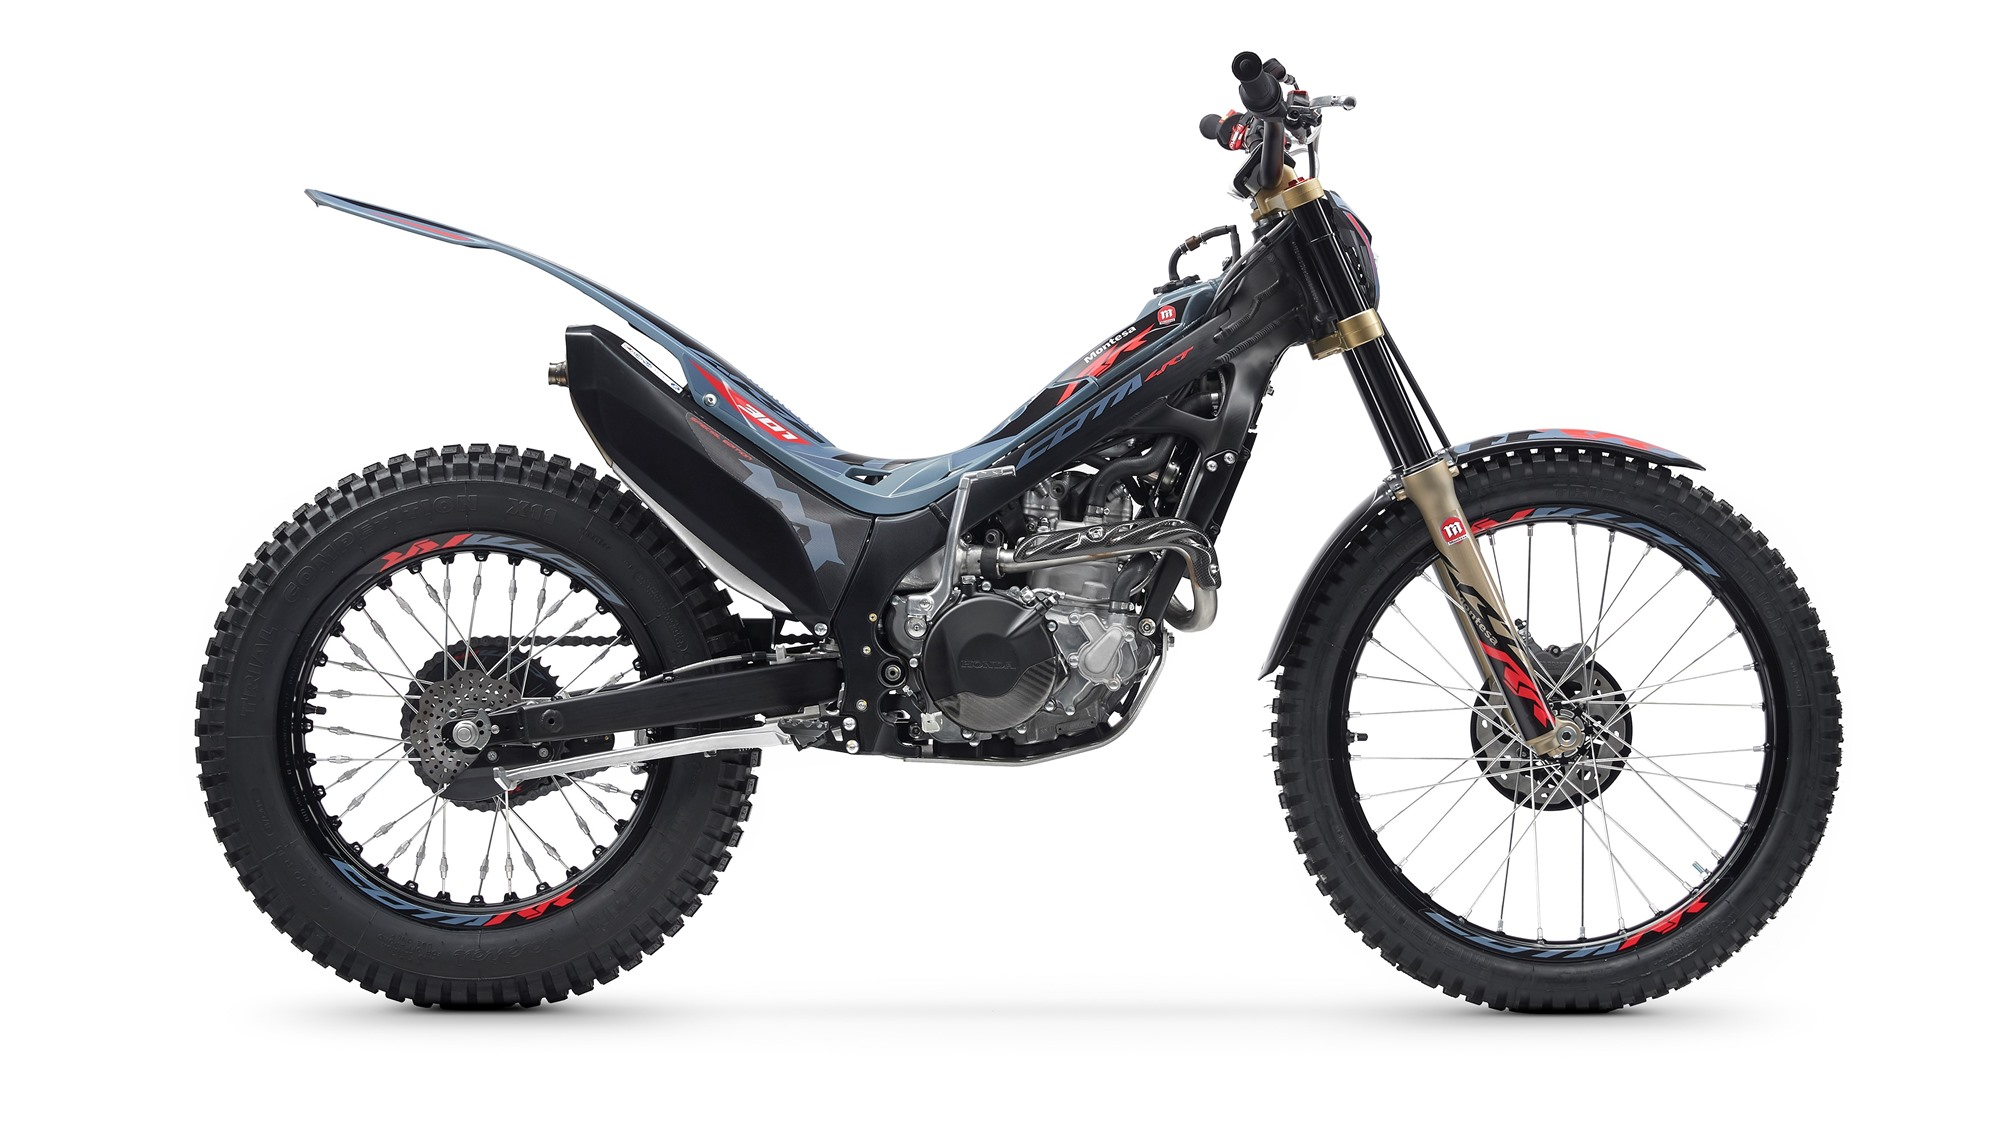 Montesa announces the Cota 301RR